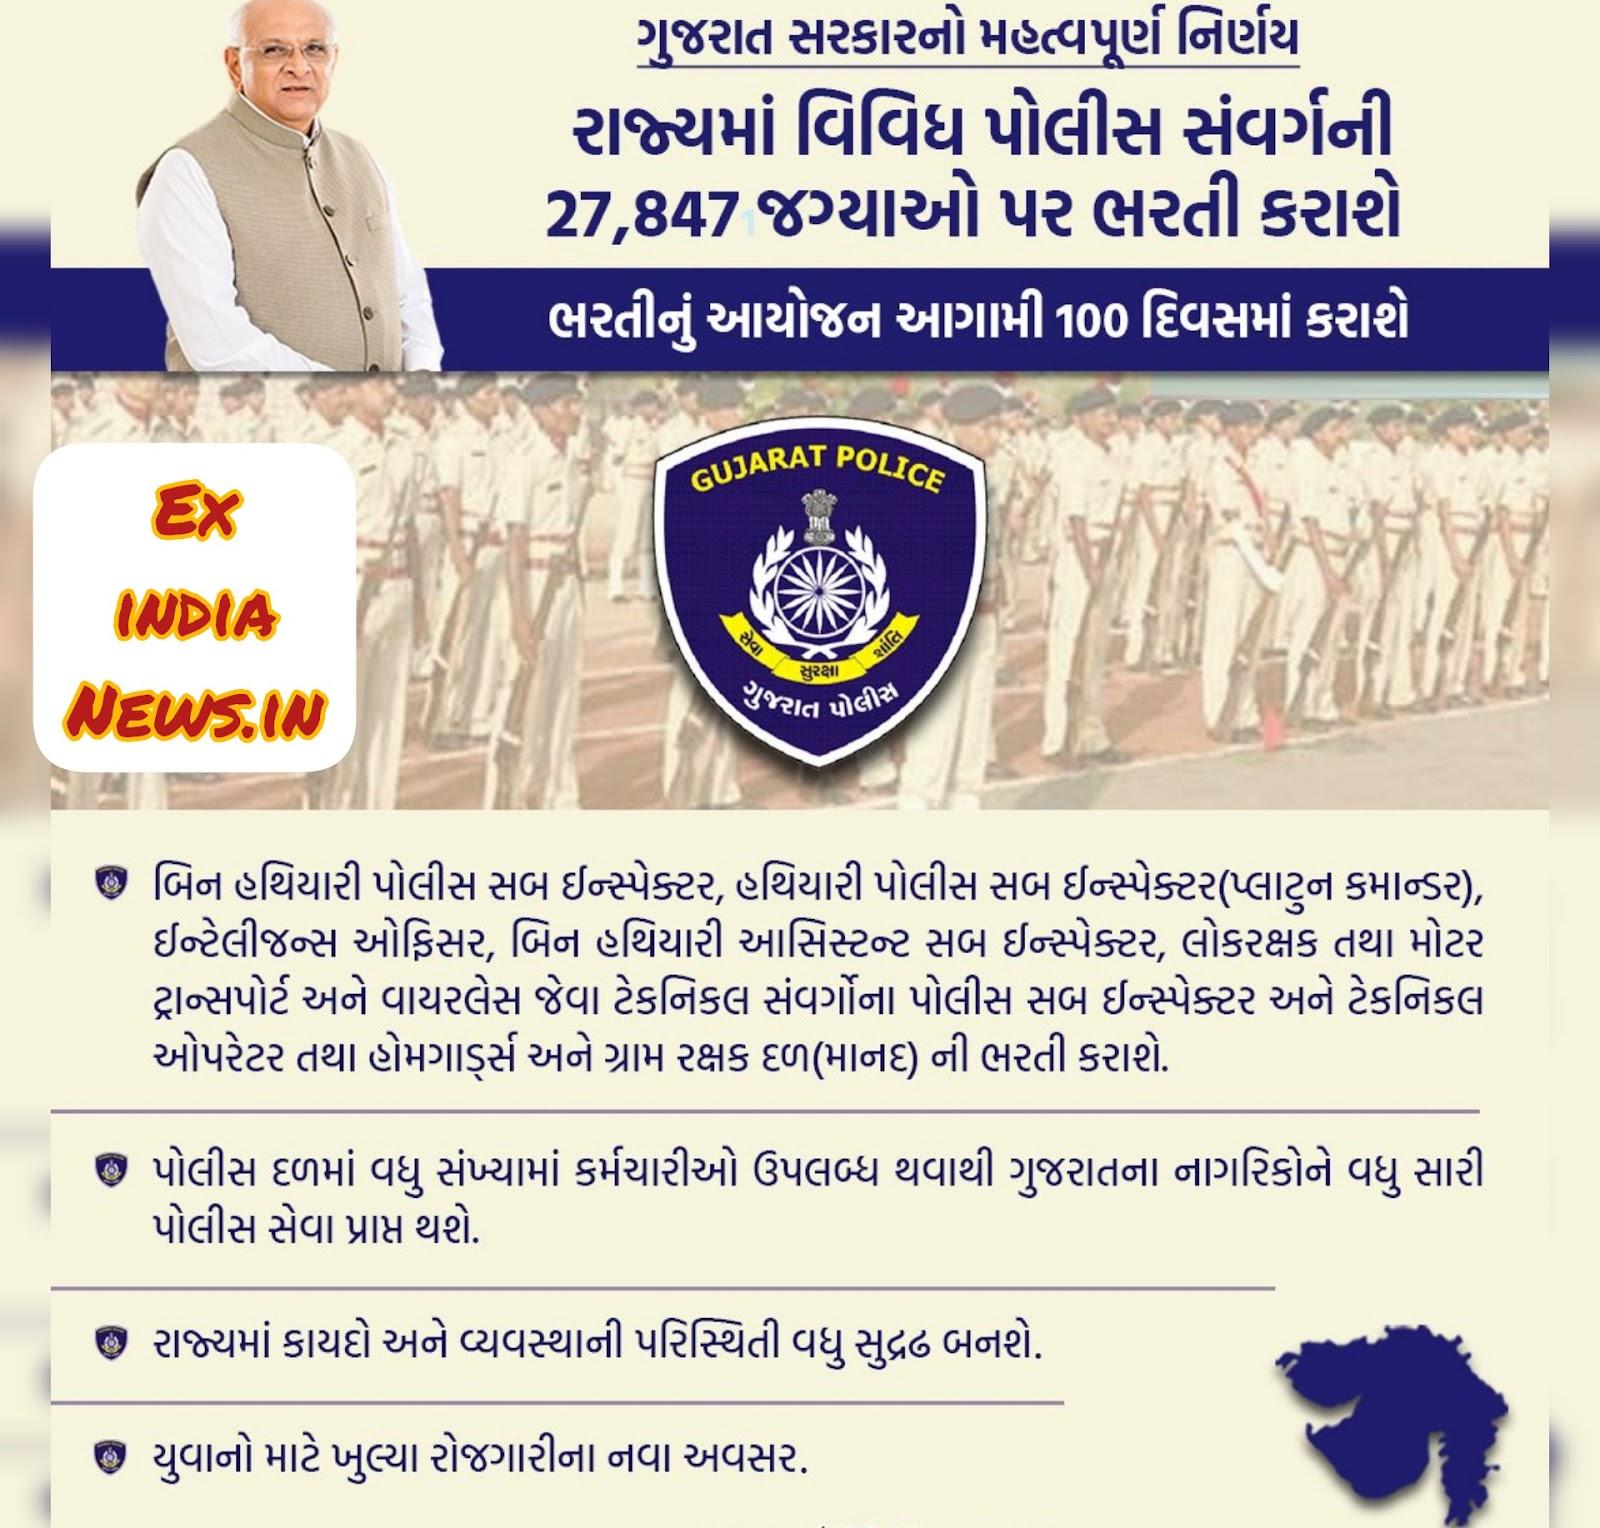 Gujarat Police 27847 PSI, Lok Rakshak Dal (LRD) Bharti 2021-22 | Syllabus, Eligibility And Apply Online - Exindianews